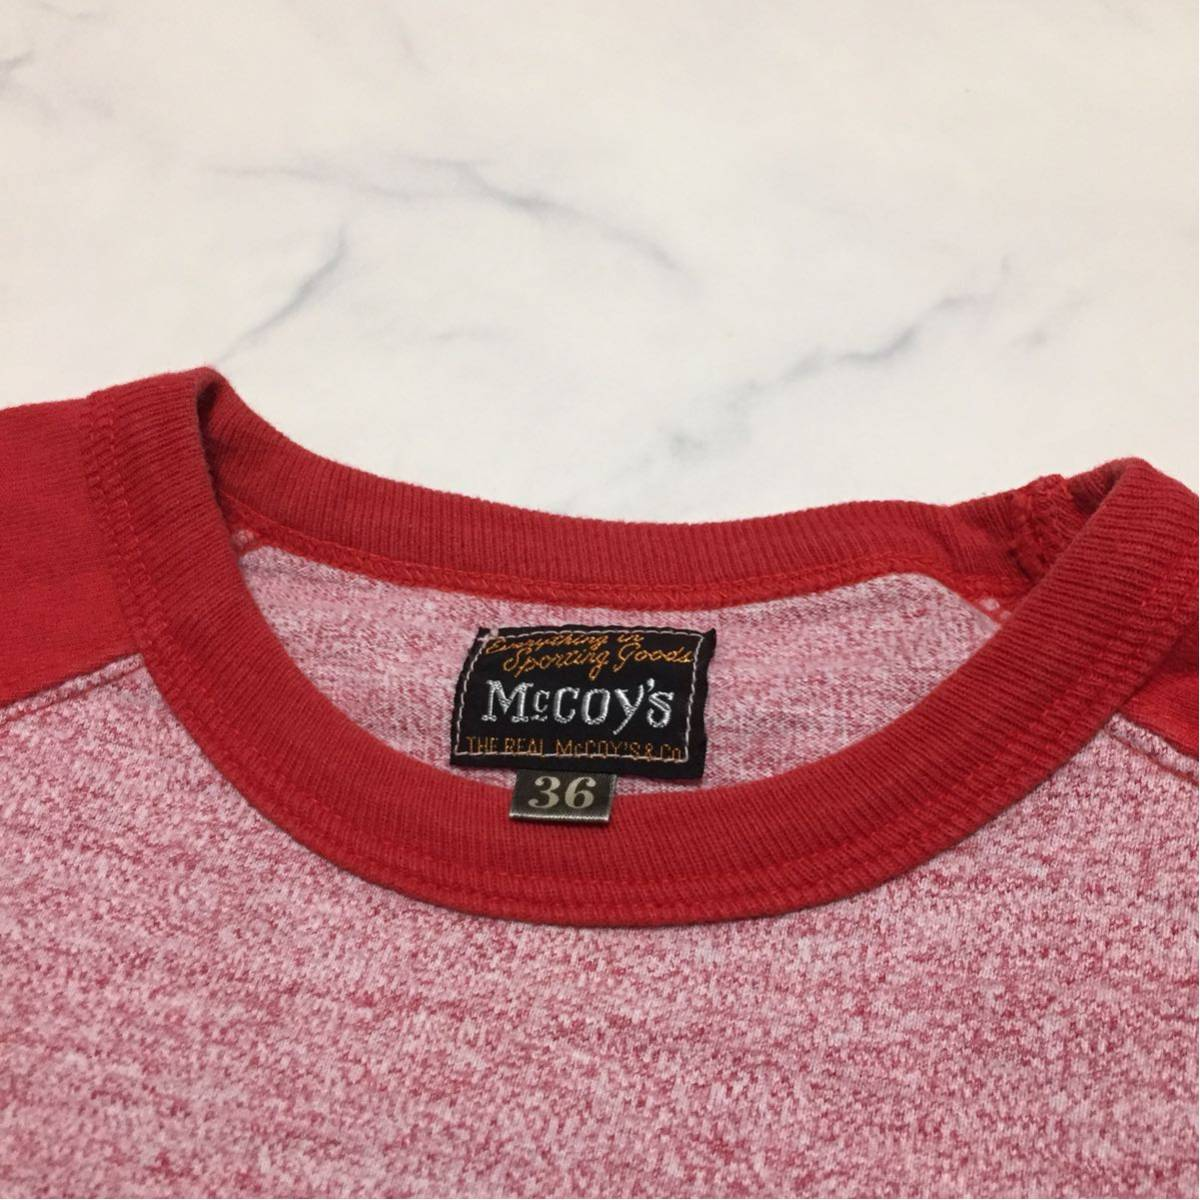 REAL McCOY'S リアルマッコイズ マッコイ ラグラン 7分丈Tシャツ 36 S_画像3